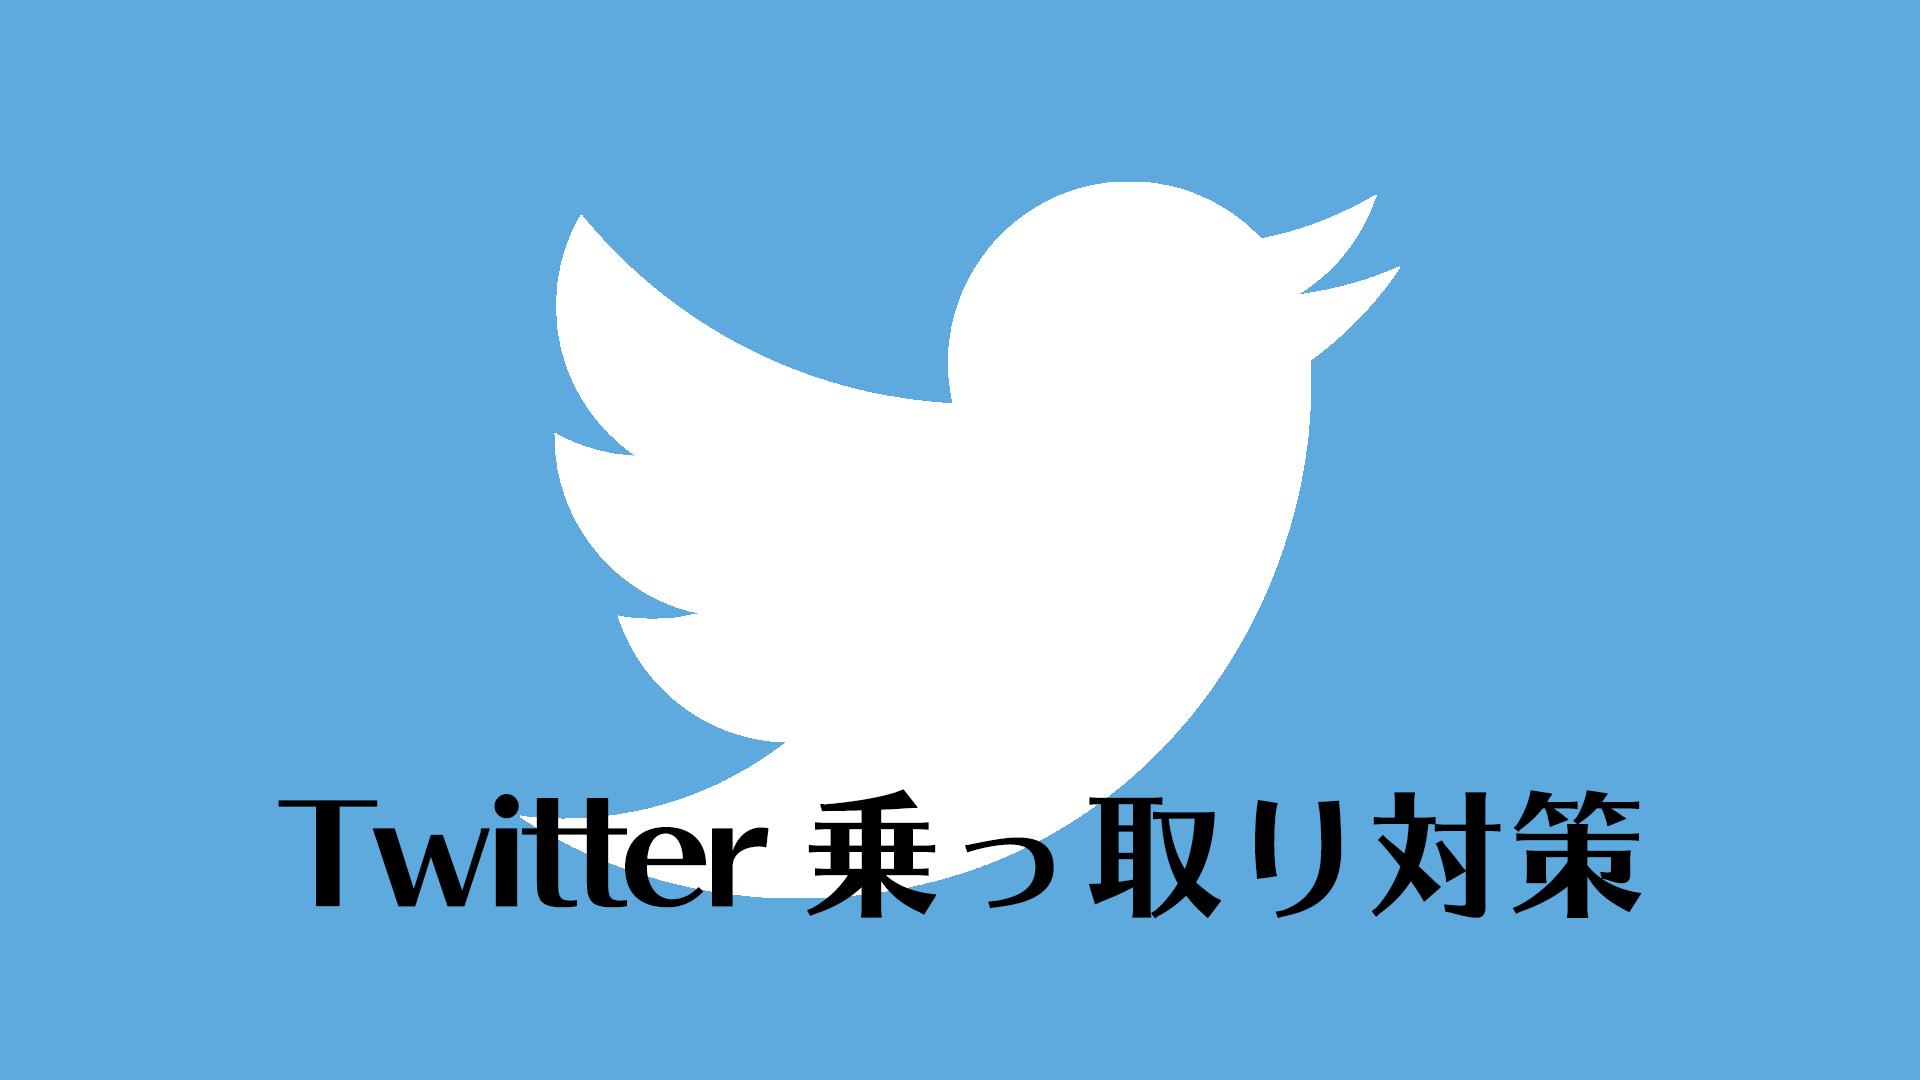 Twitter 乗っ取り 対策 アプリ連携